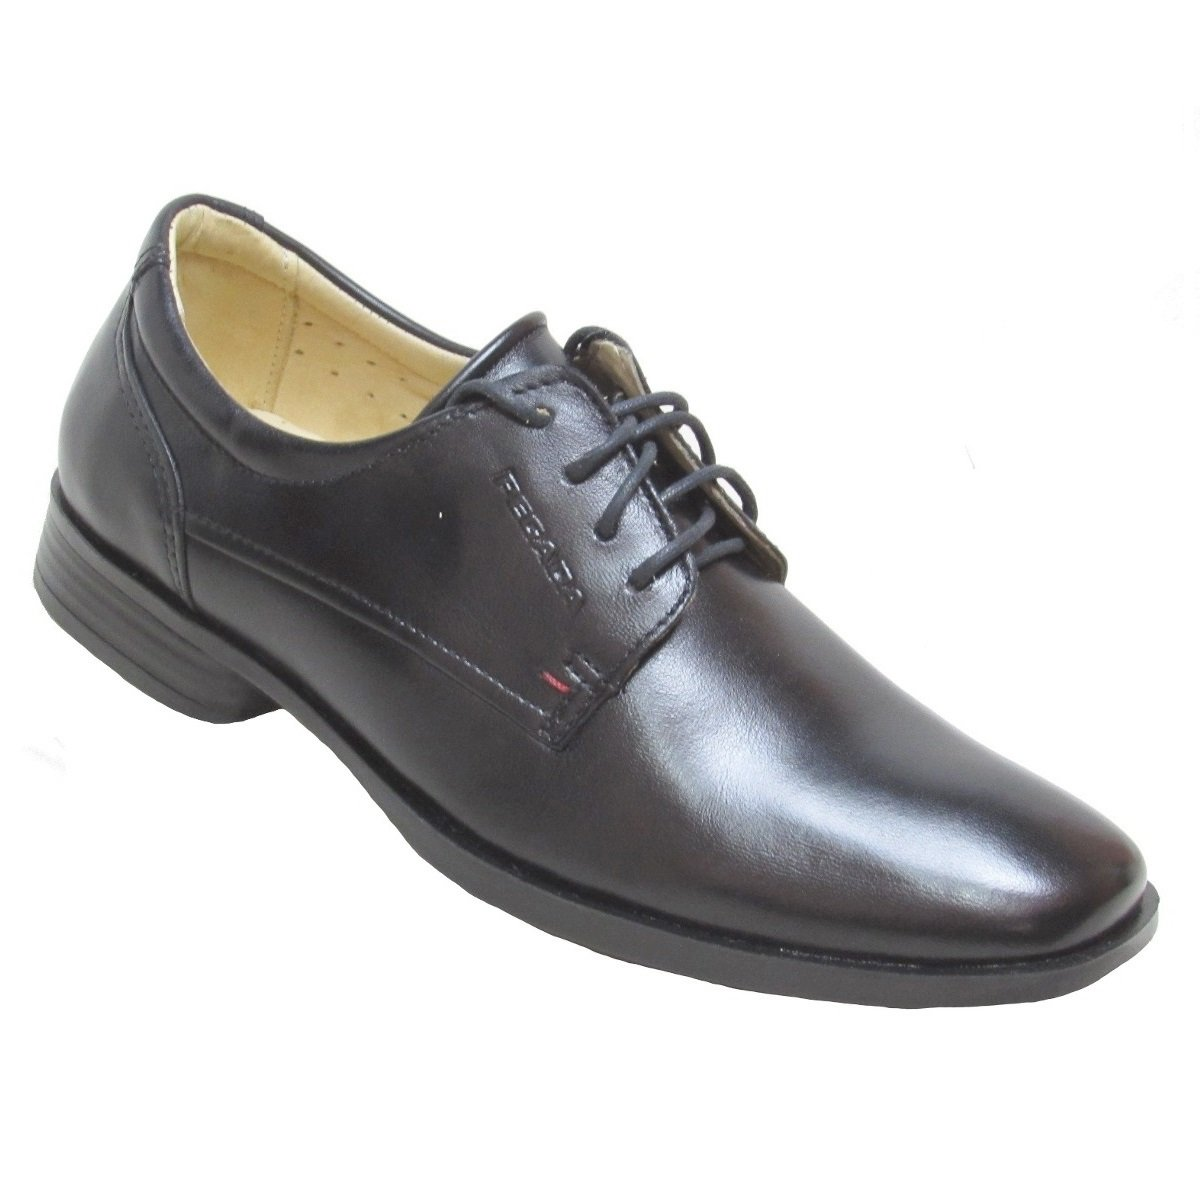 cbb959b02c Sapato Masculino Pegada Levitech 21051-01 - Preto (Mestiço ...